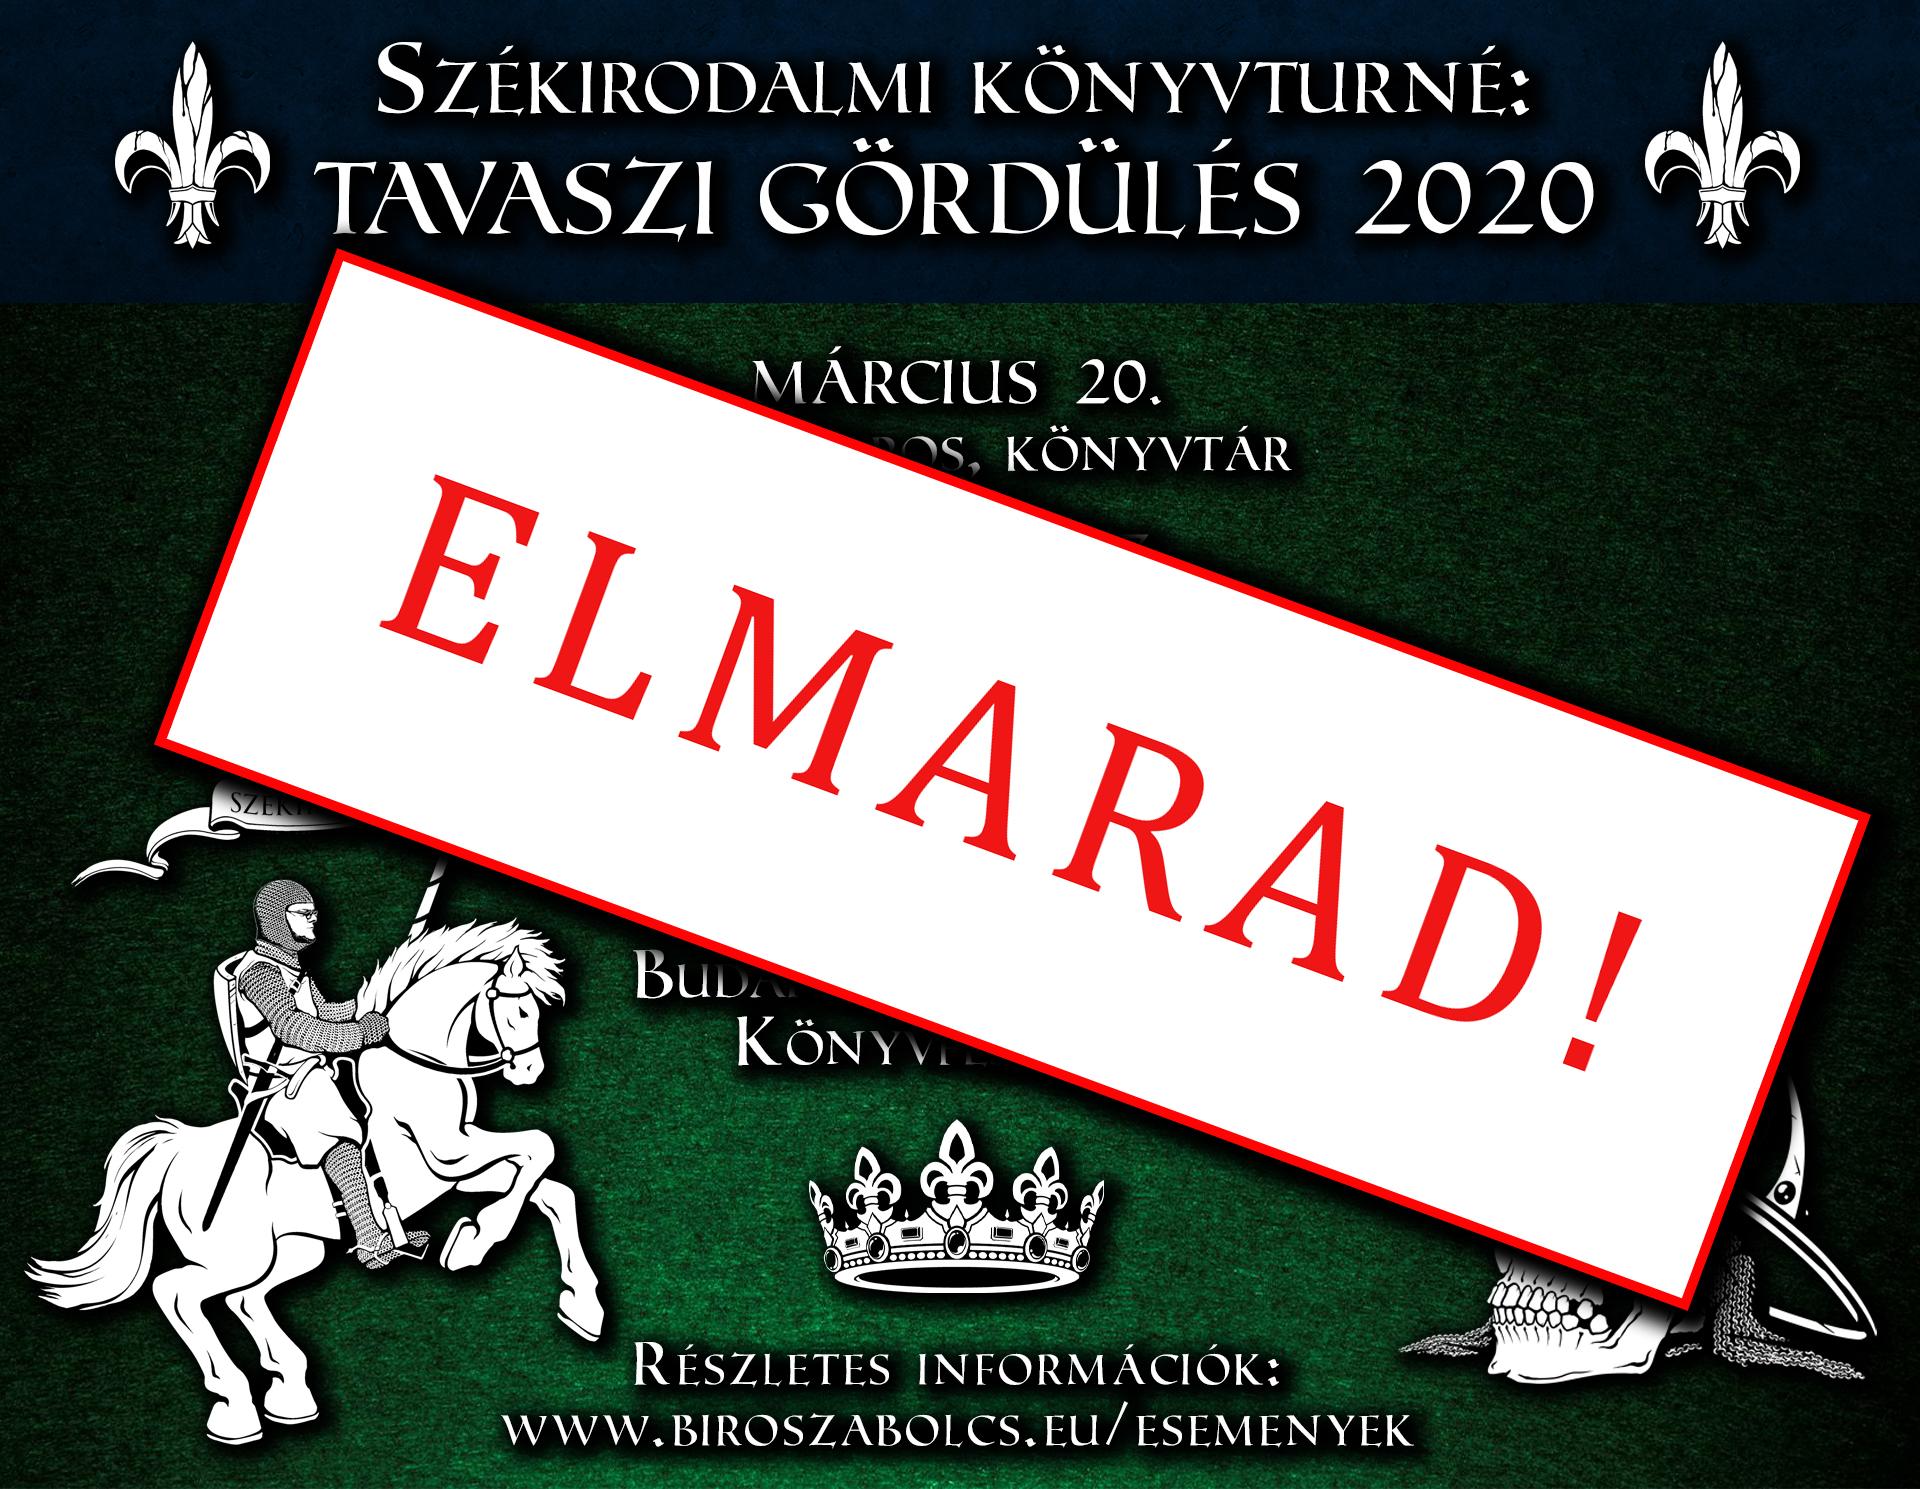 tavaszi_gordules_2020_torolve_2.jpg